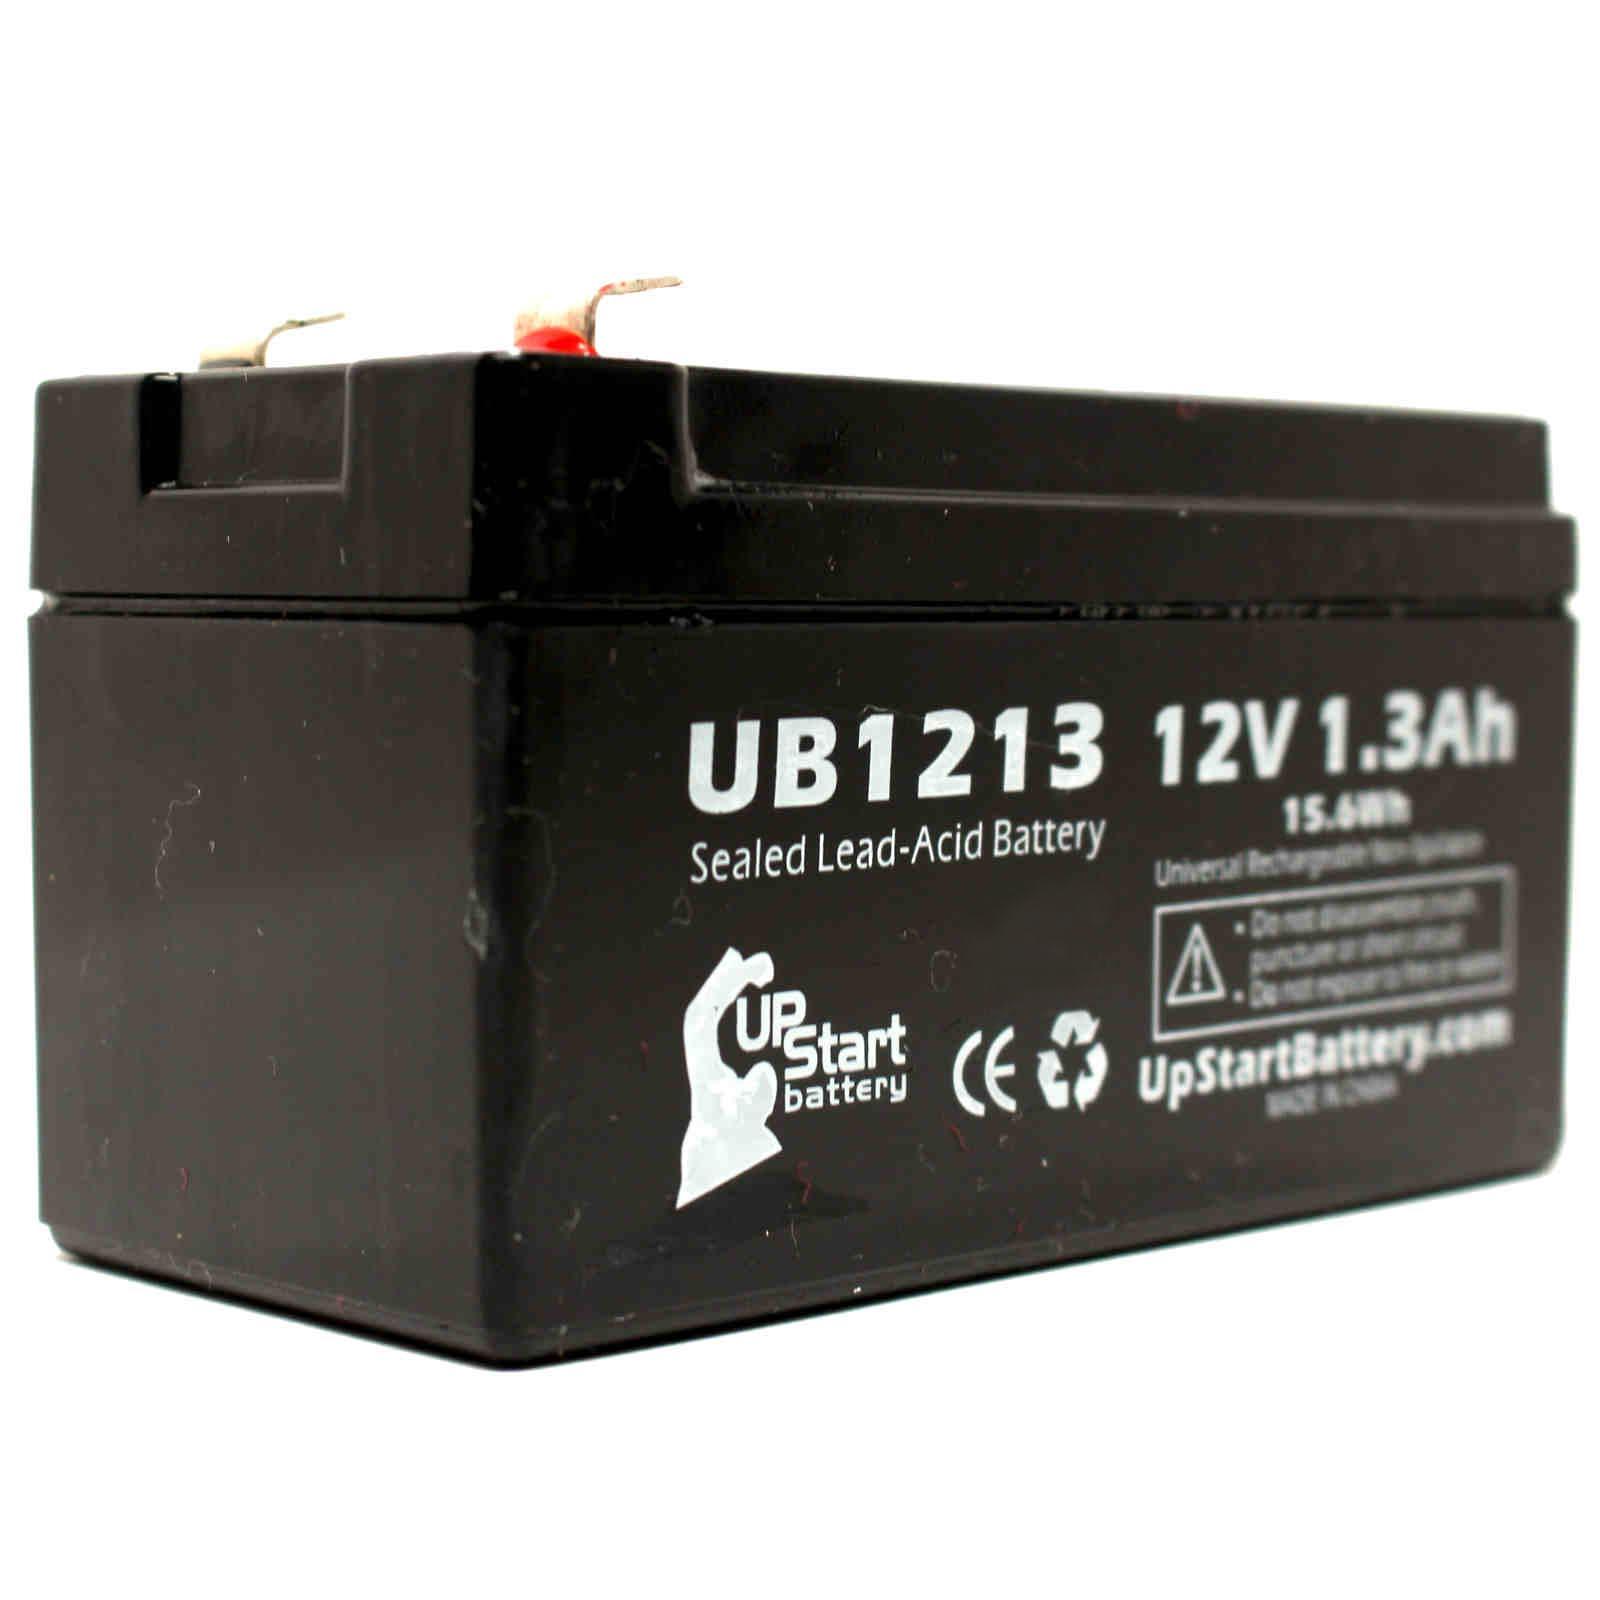 Werker Wka12 1 3f Battery Ub1213 12v 1 3ah Sealed Lead